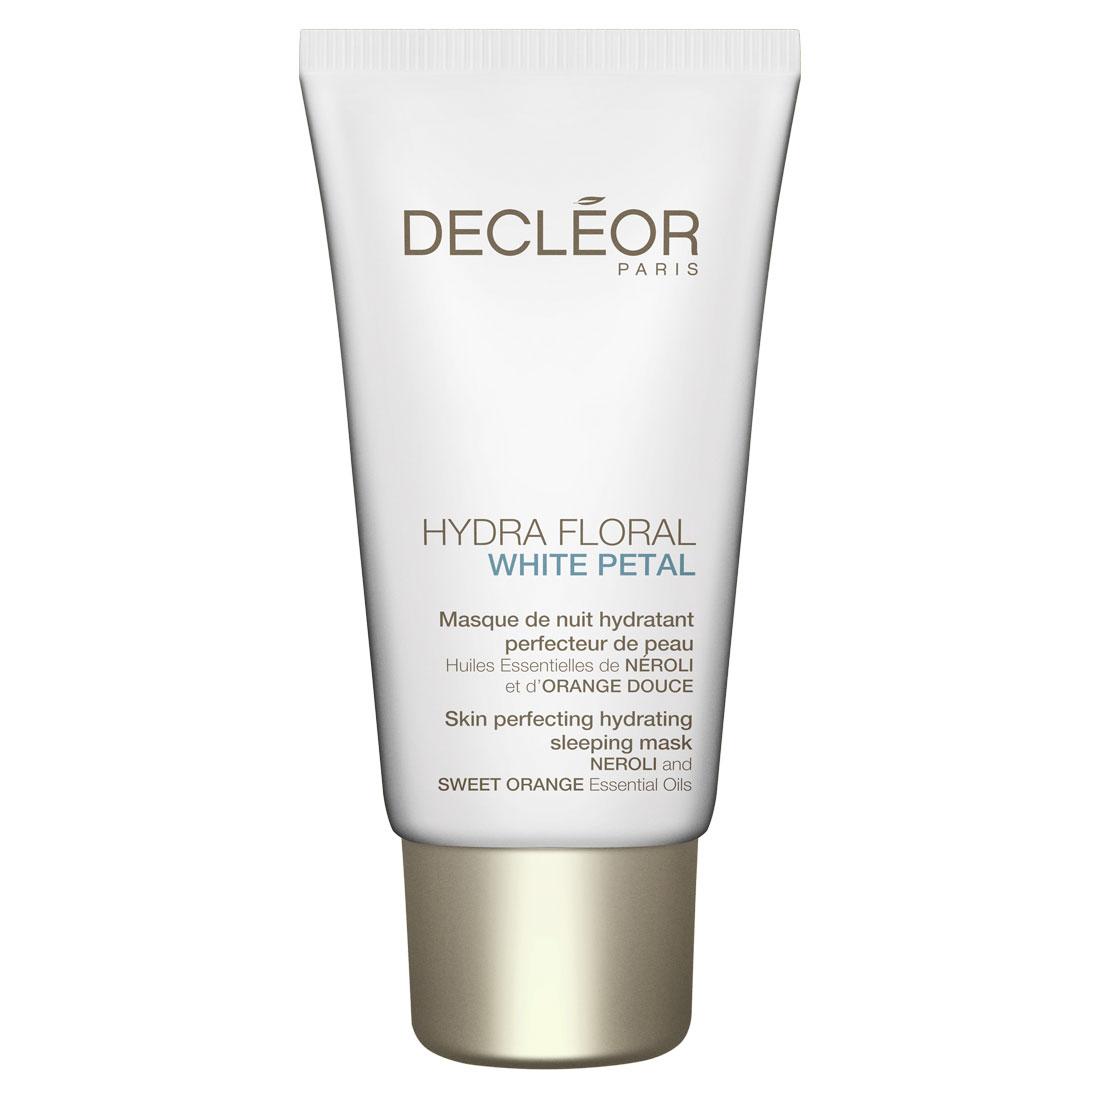 Hydra Floral White Petal Reparing & Renovating Sleeping Mask 50ml